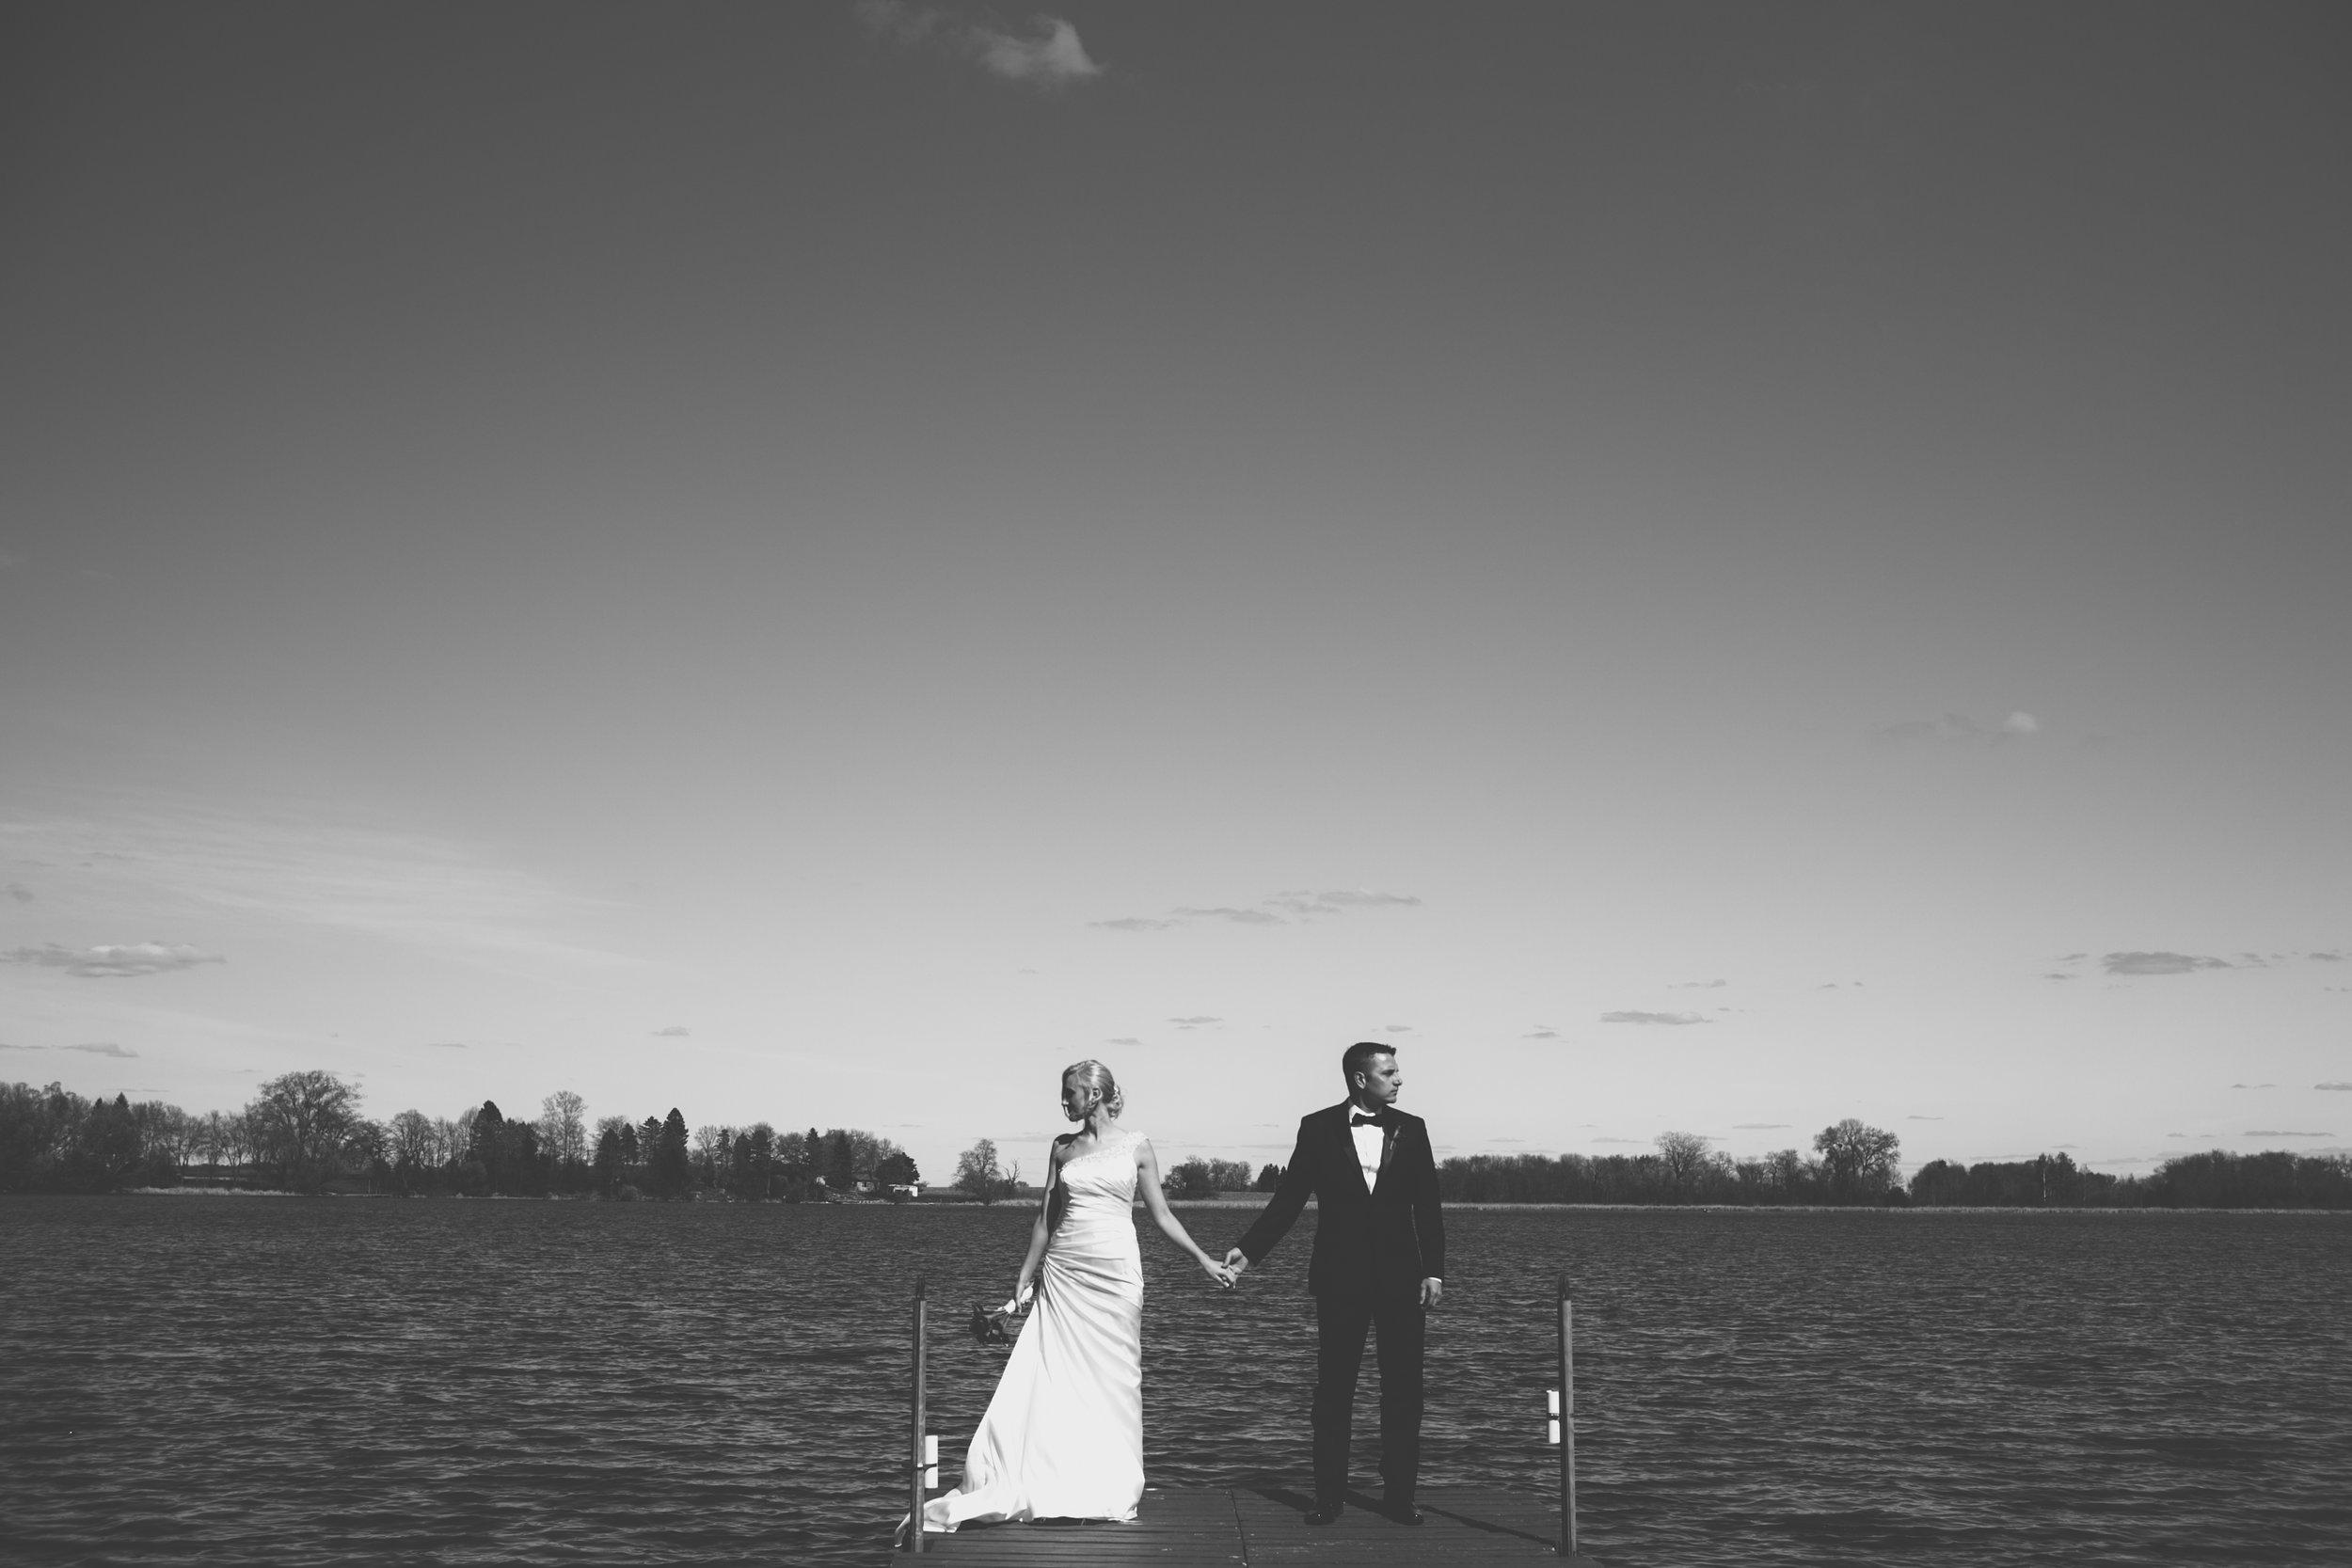 Mark Fierst Minneapolis Wedding Photographer | Sixpence Standard blog post | lakeside wedding backdrop